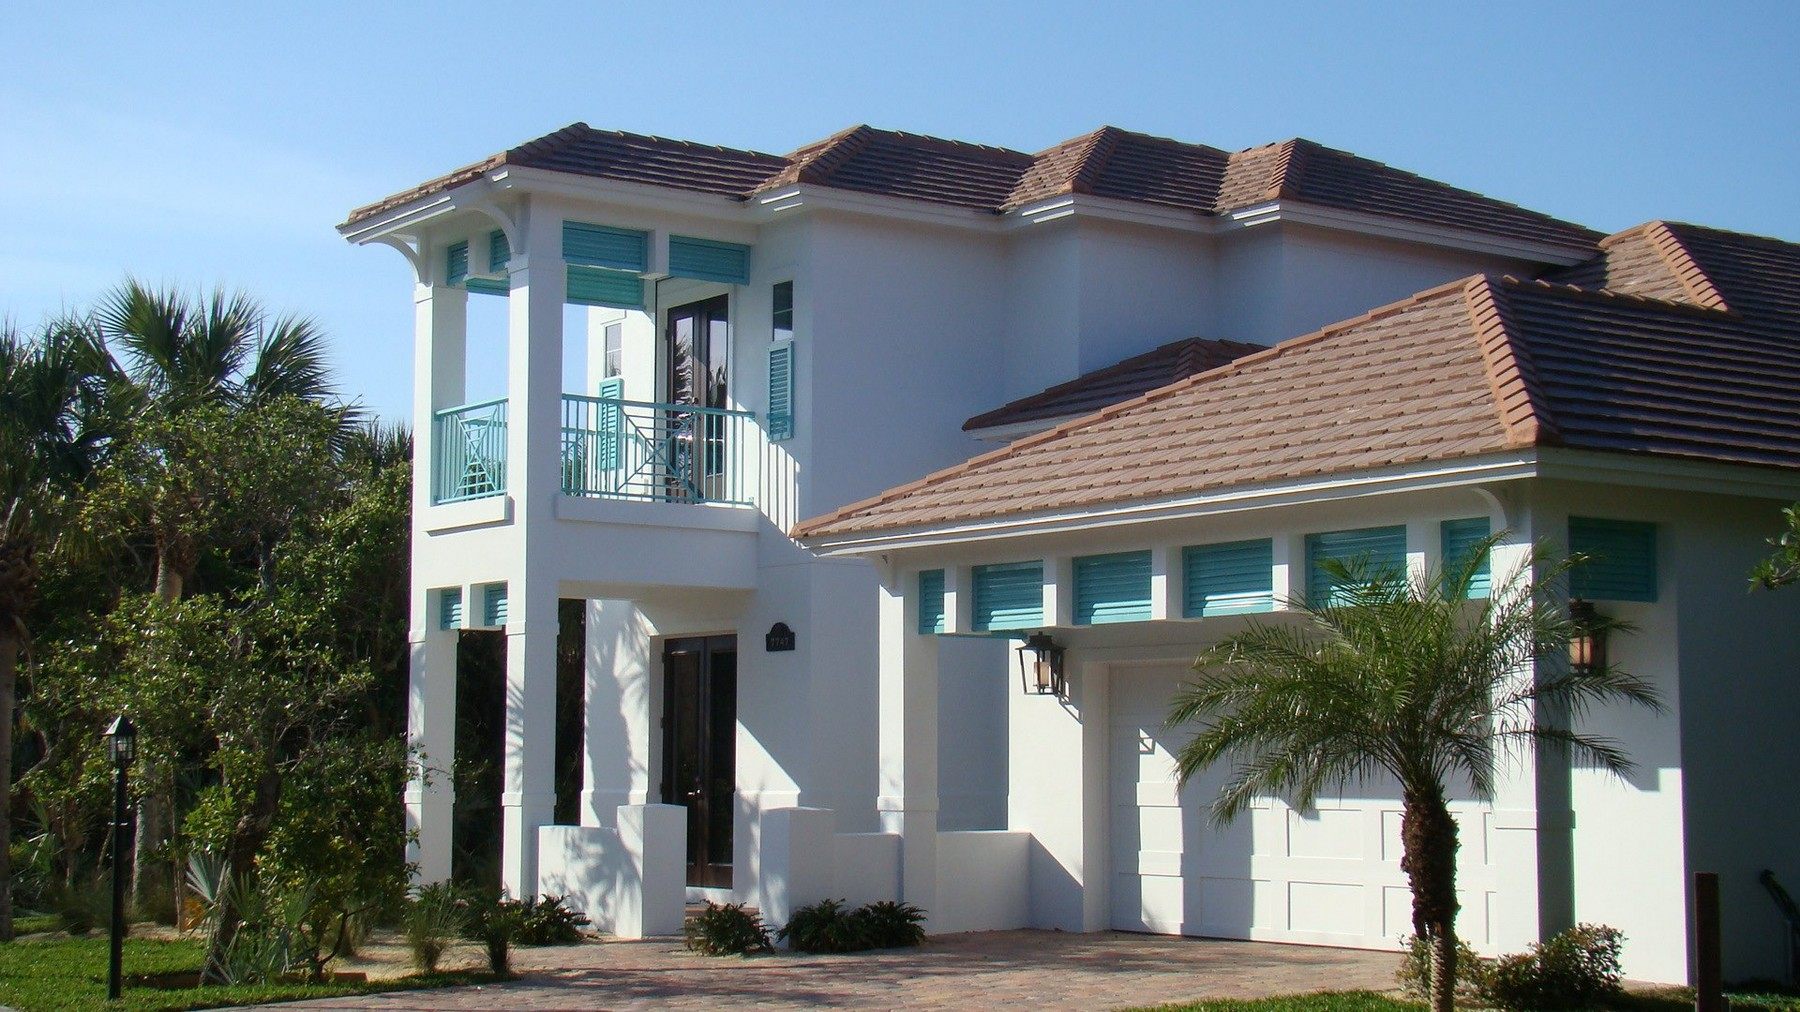 Bells, Whistles and Upgrades! 7747 Kiawah Way Melbourne Beach, Florida 32951 Usa